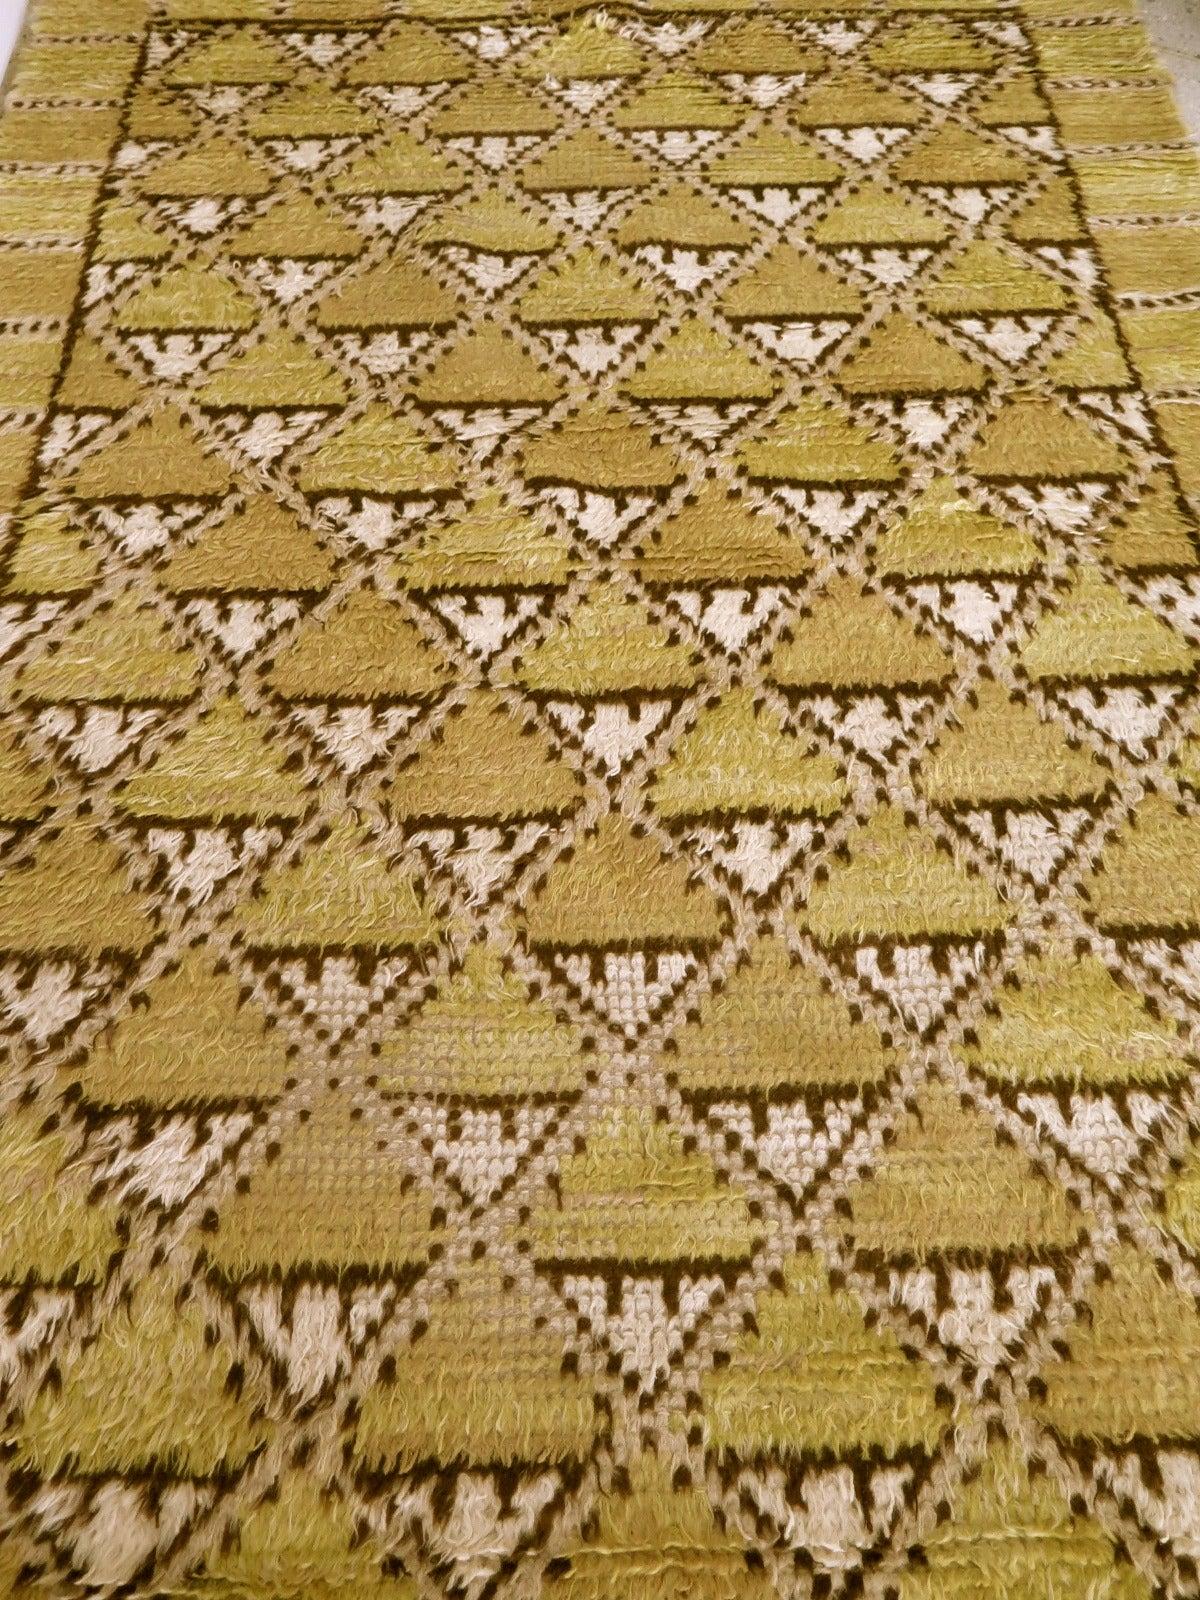 Geometric Rya Carpet by Marta Maas-Fjetterström 3